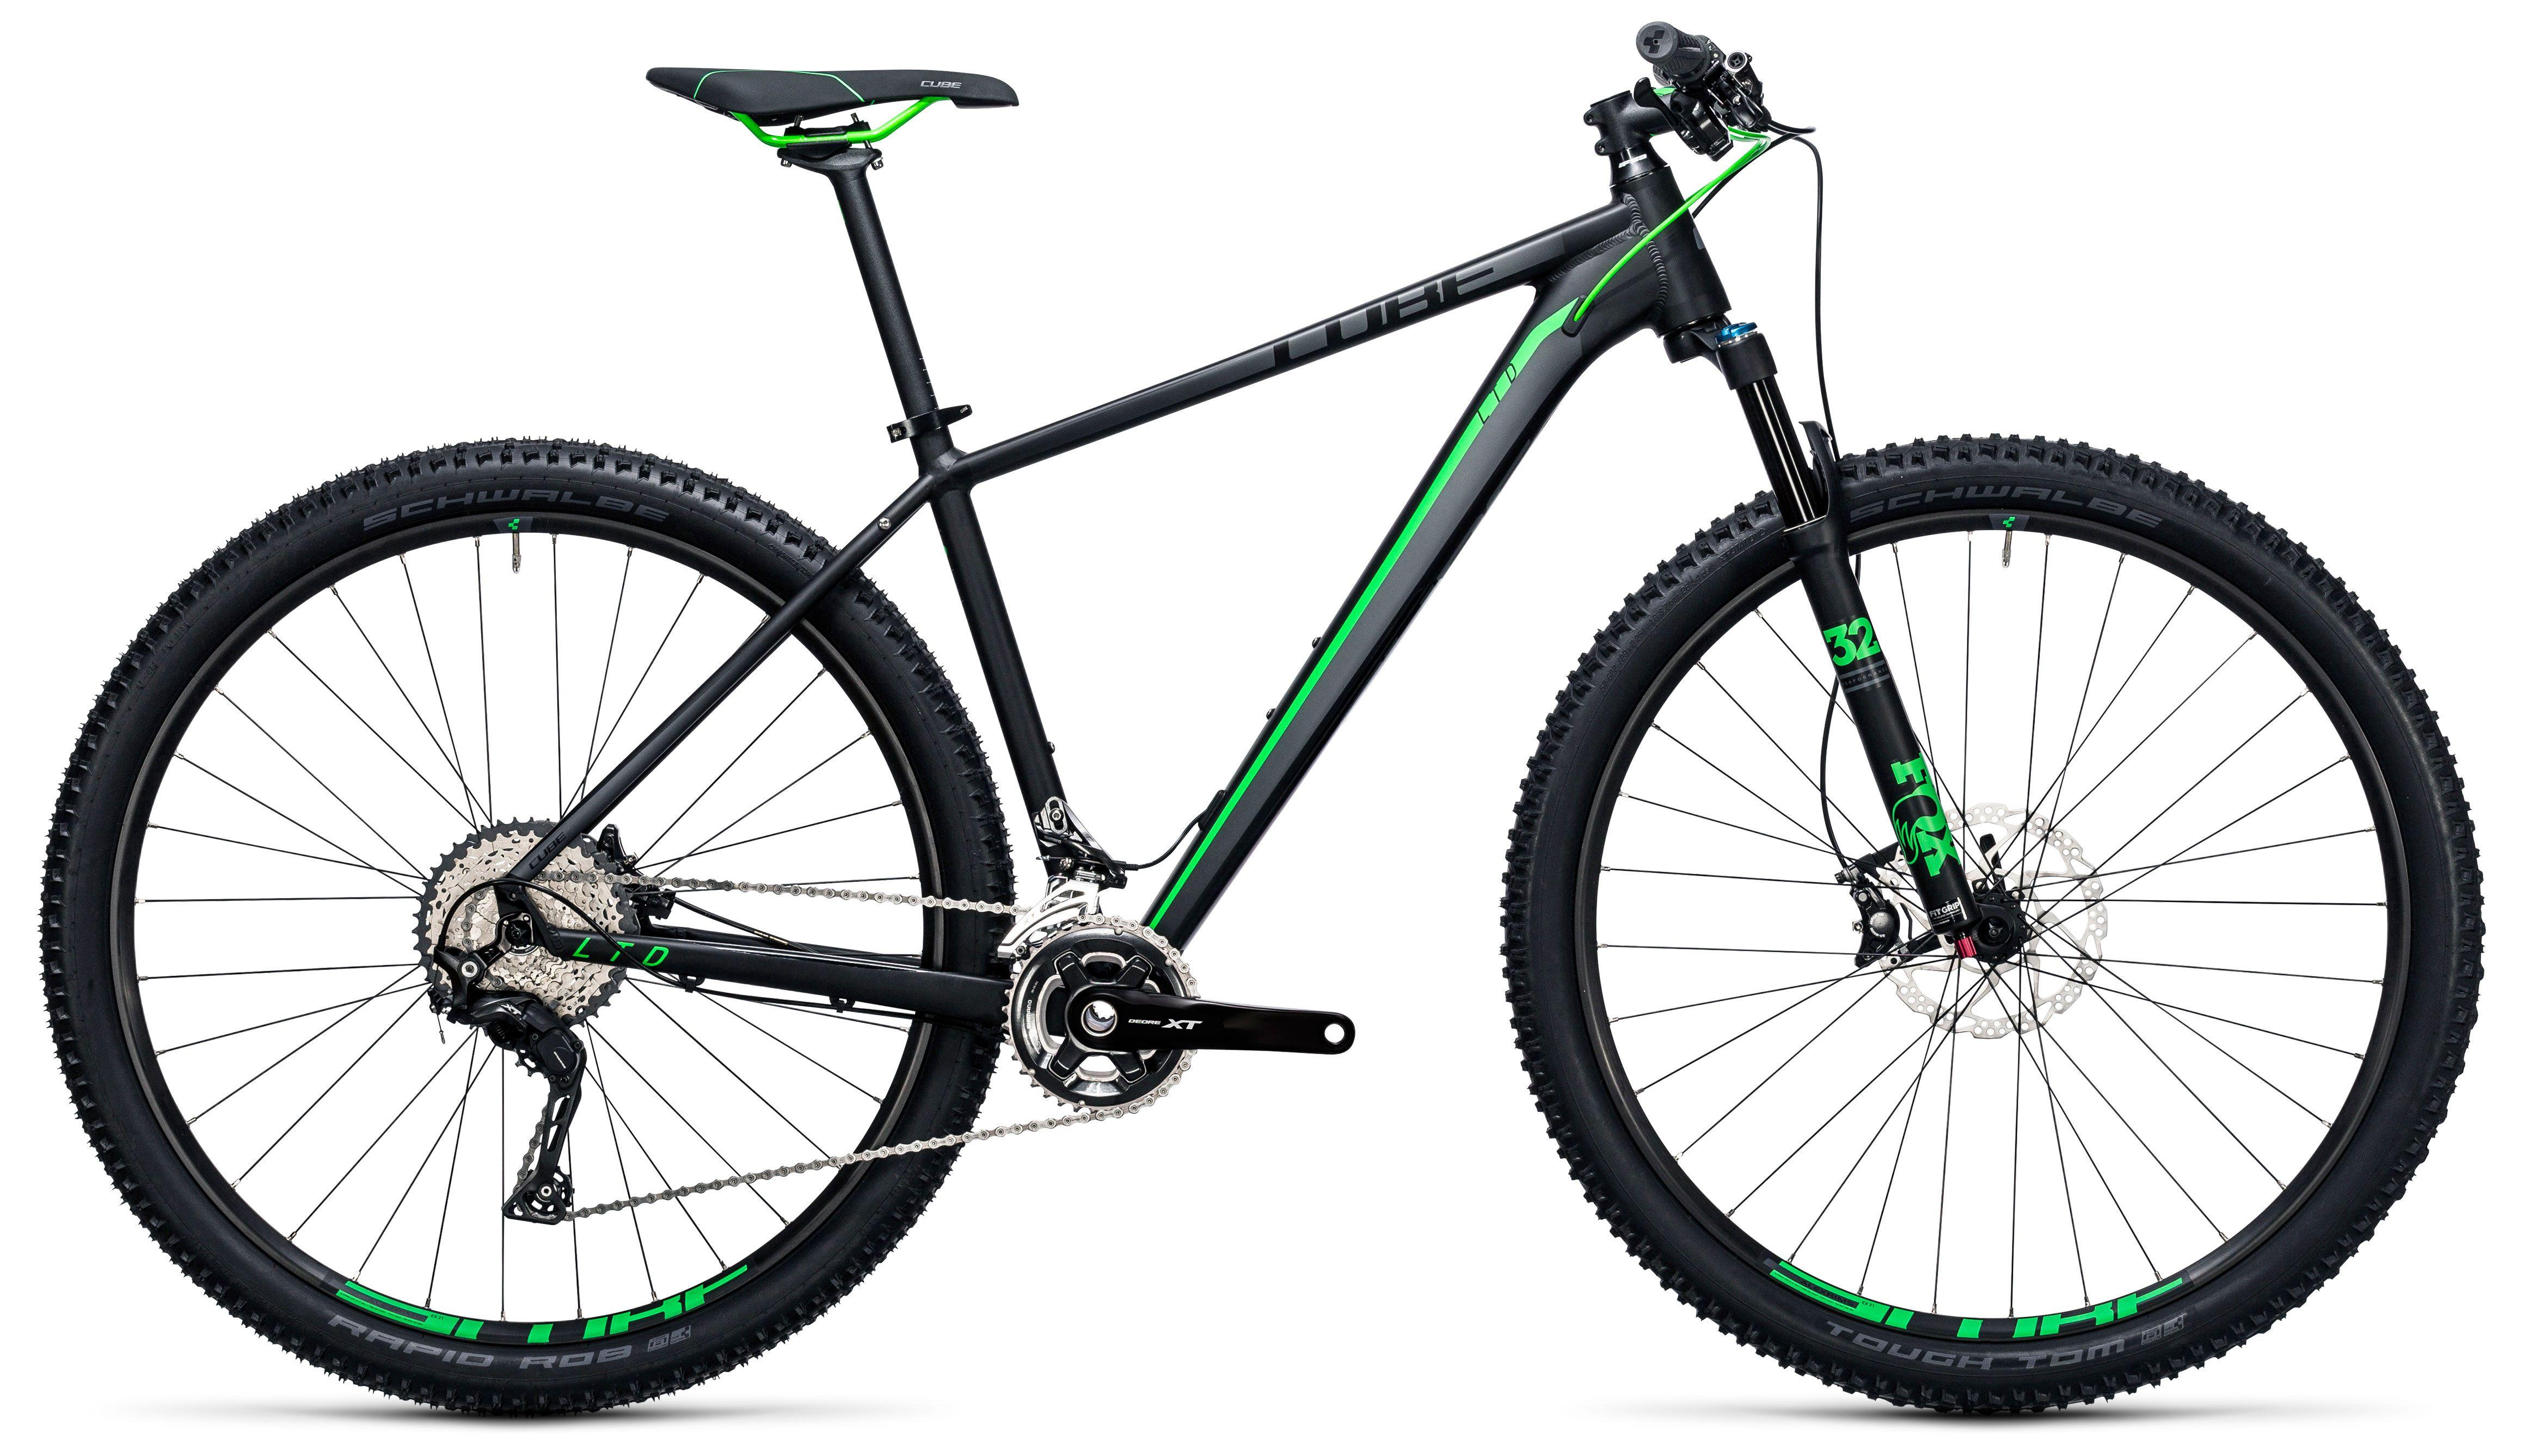 Велосипед Cube LTD SL 29 2017,  Горные  - артикул:272968